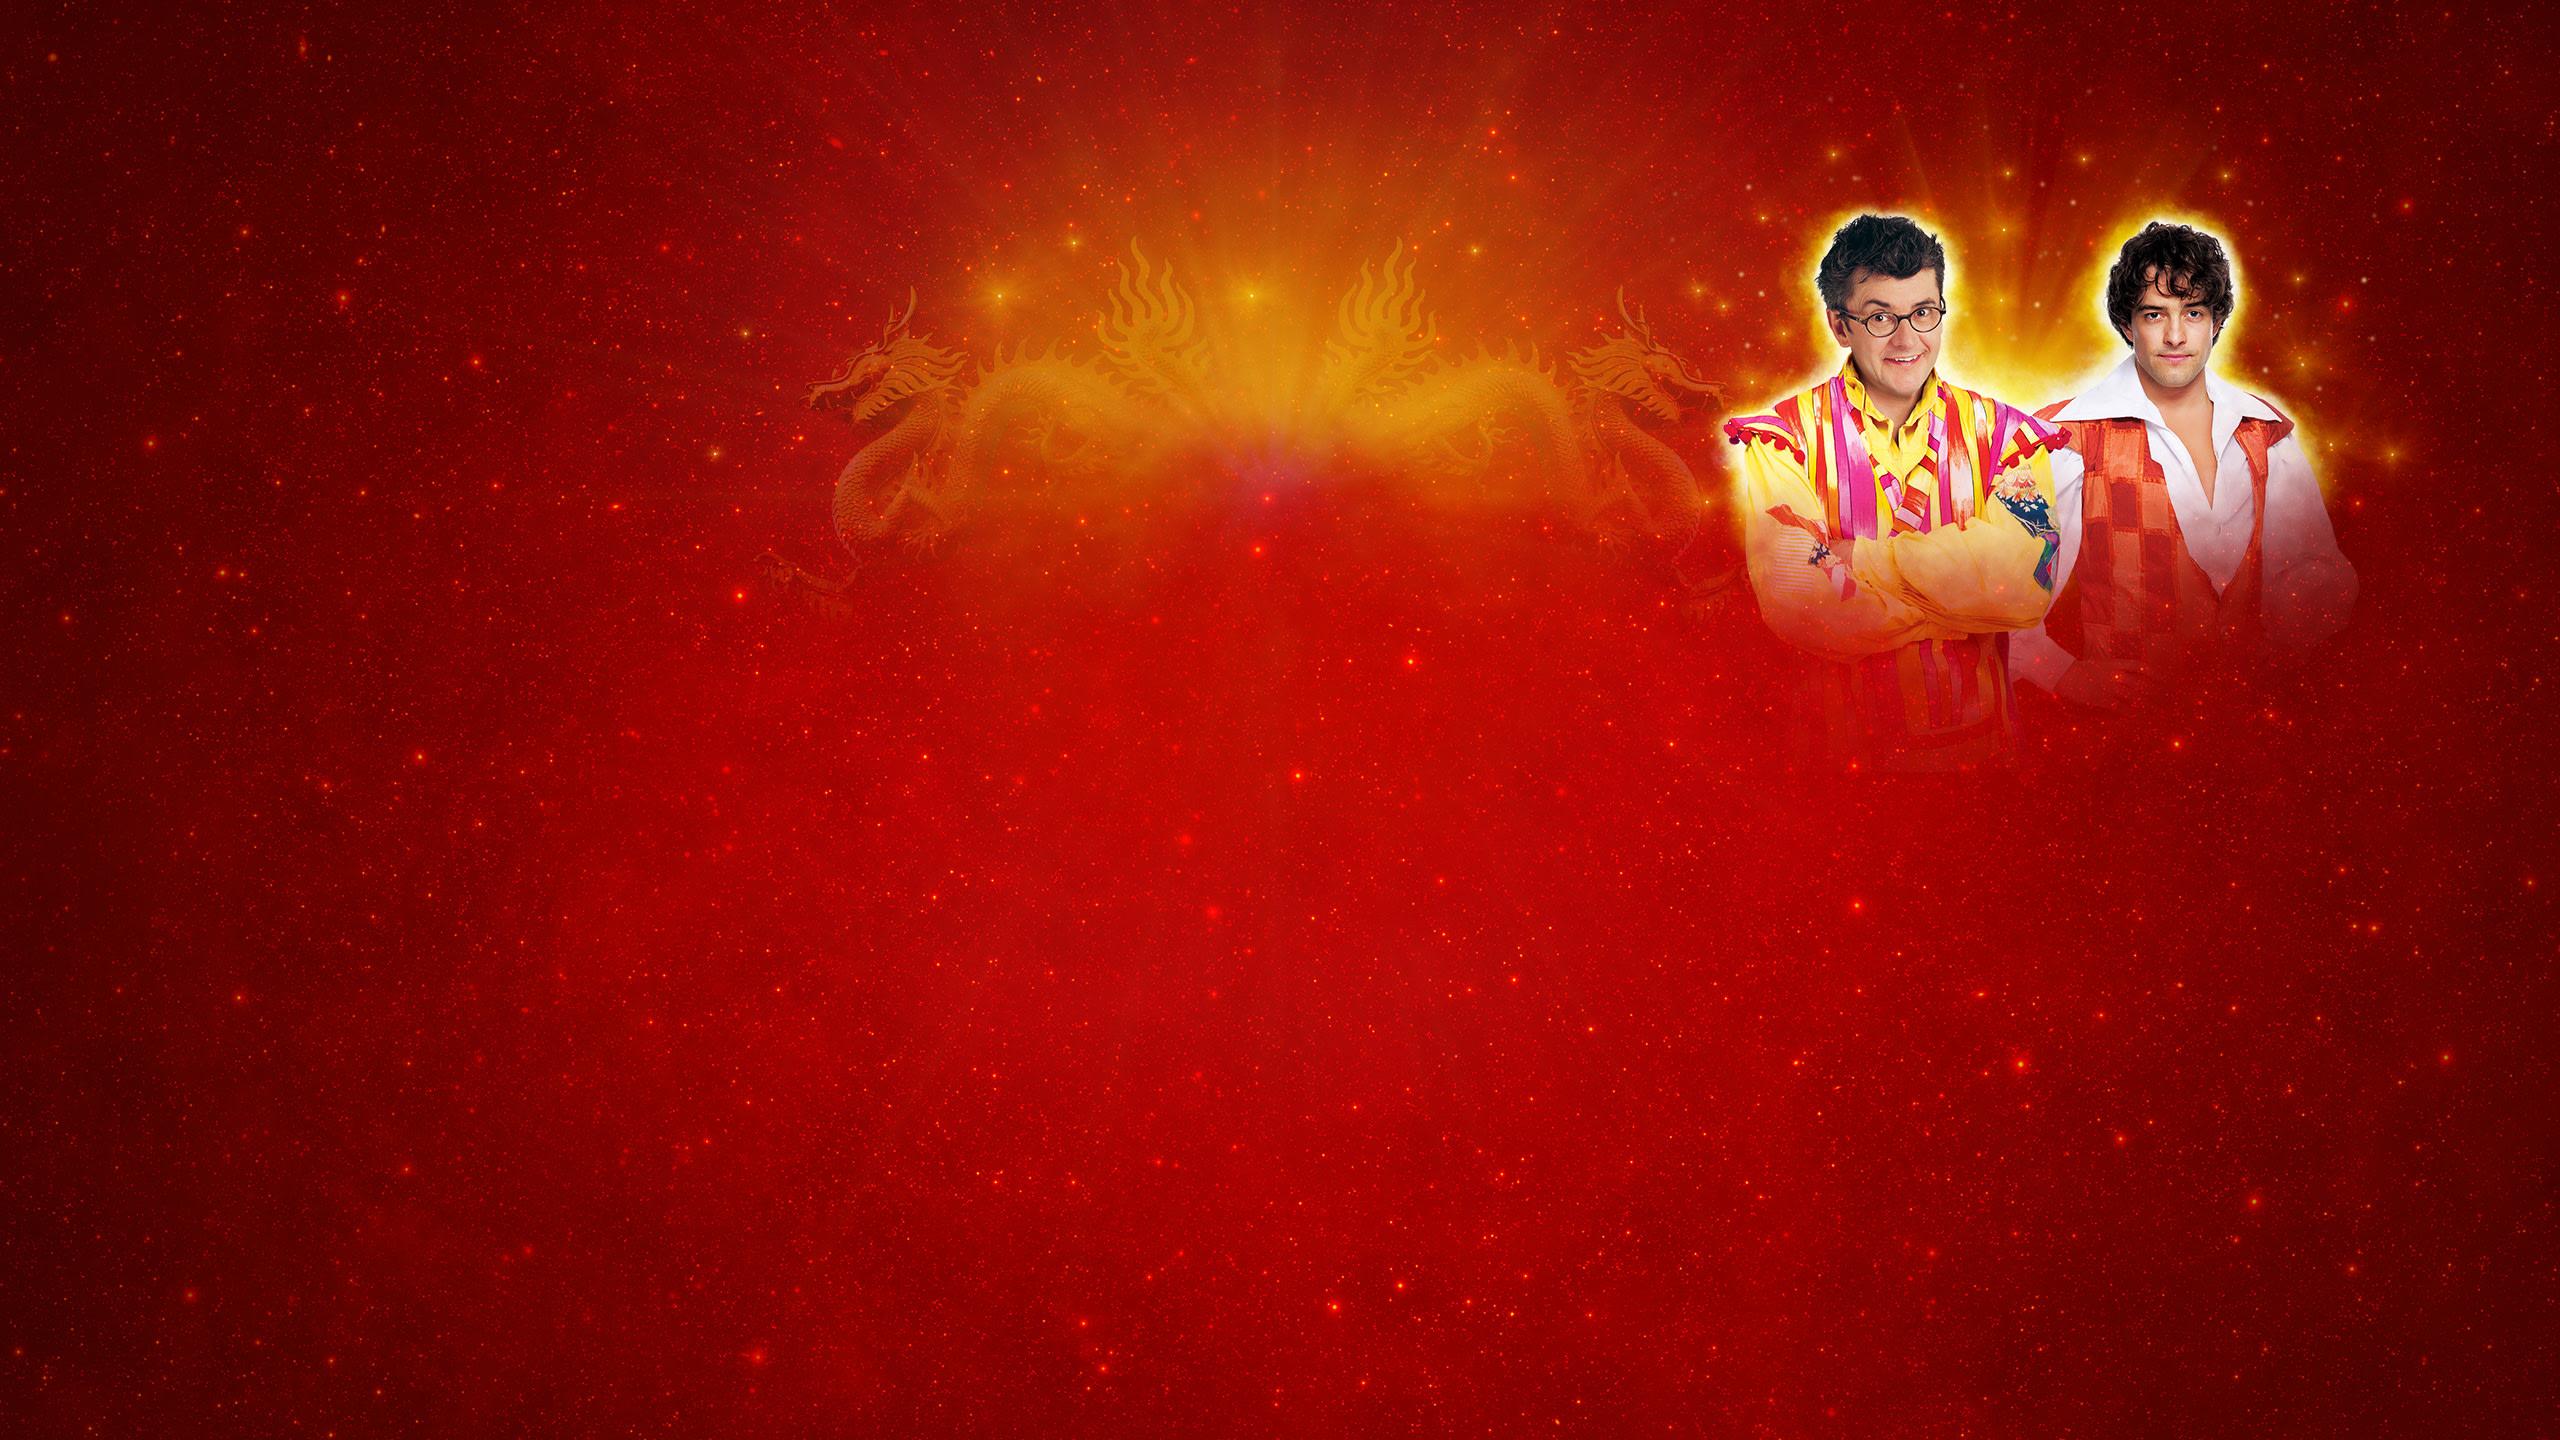 Aladdin MK header